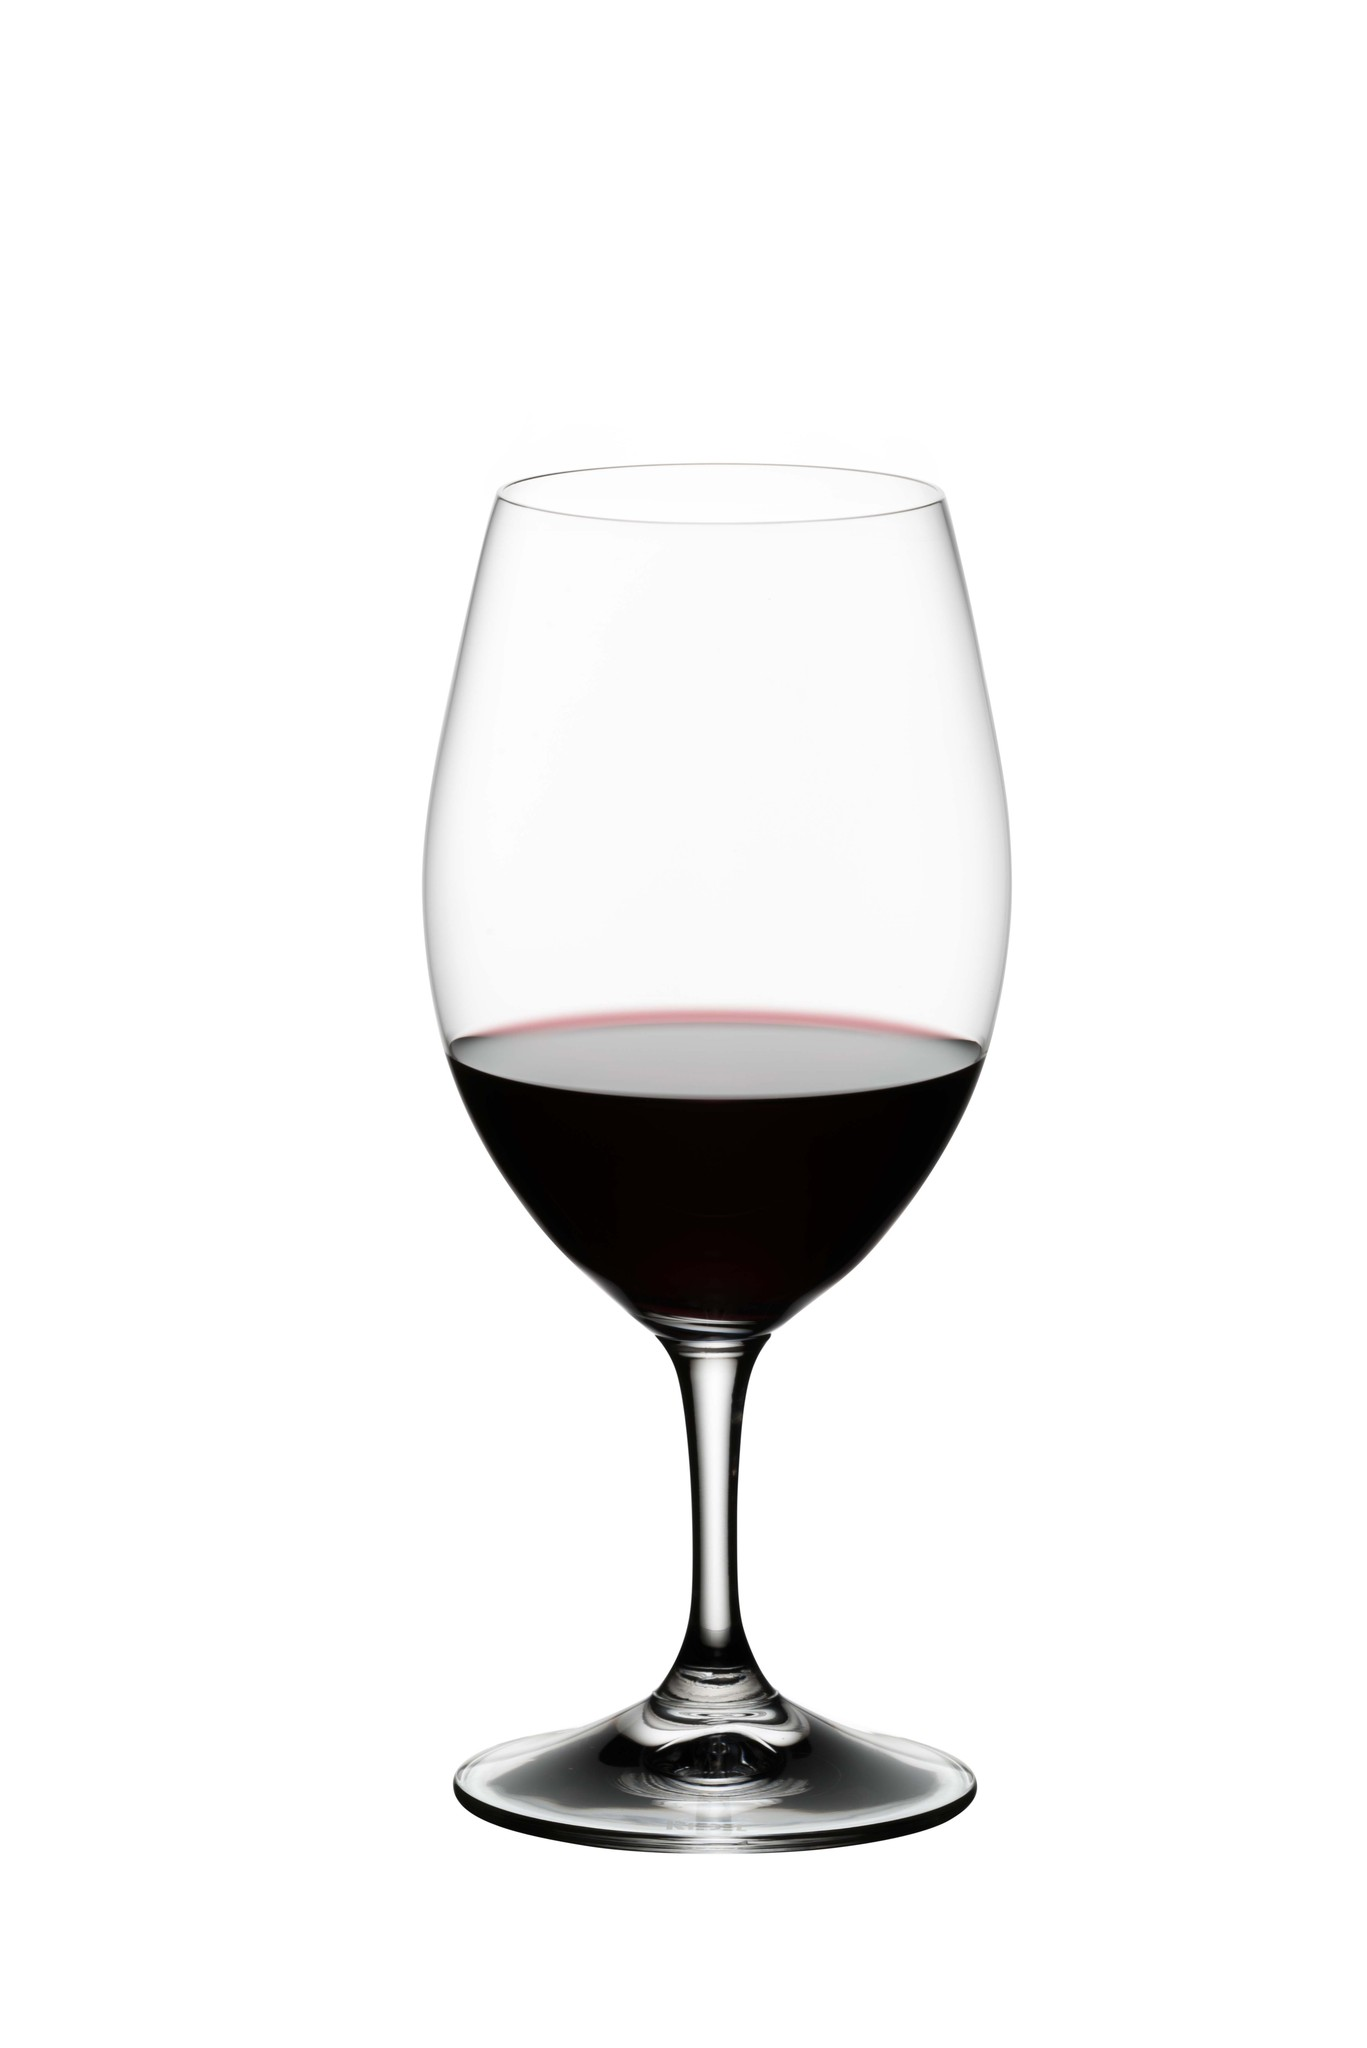 Бокалы Набор бокалов для красного вина 2шт 530мл Riedel Ouverture Magnum nabor-bokalov-dlya-krasnogo-vina-2-sht-530-ml-riedel-ouverture-magnum-avstriya.jpg